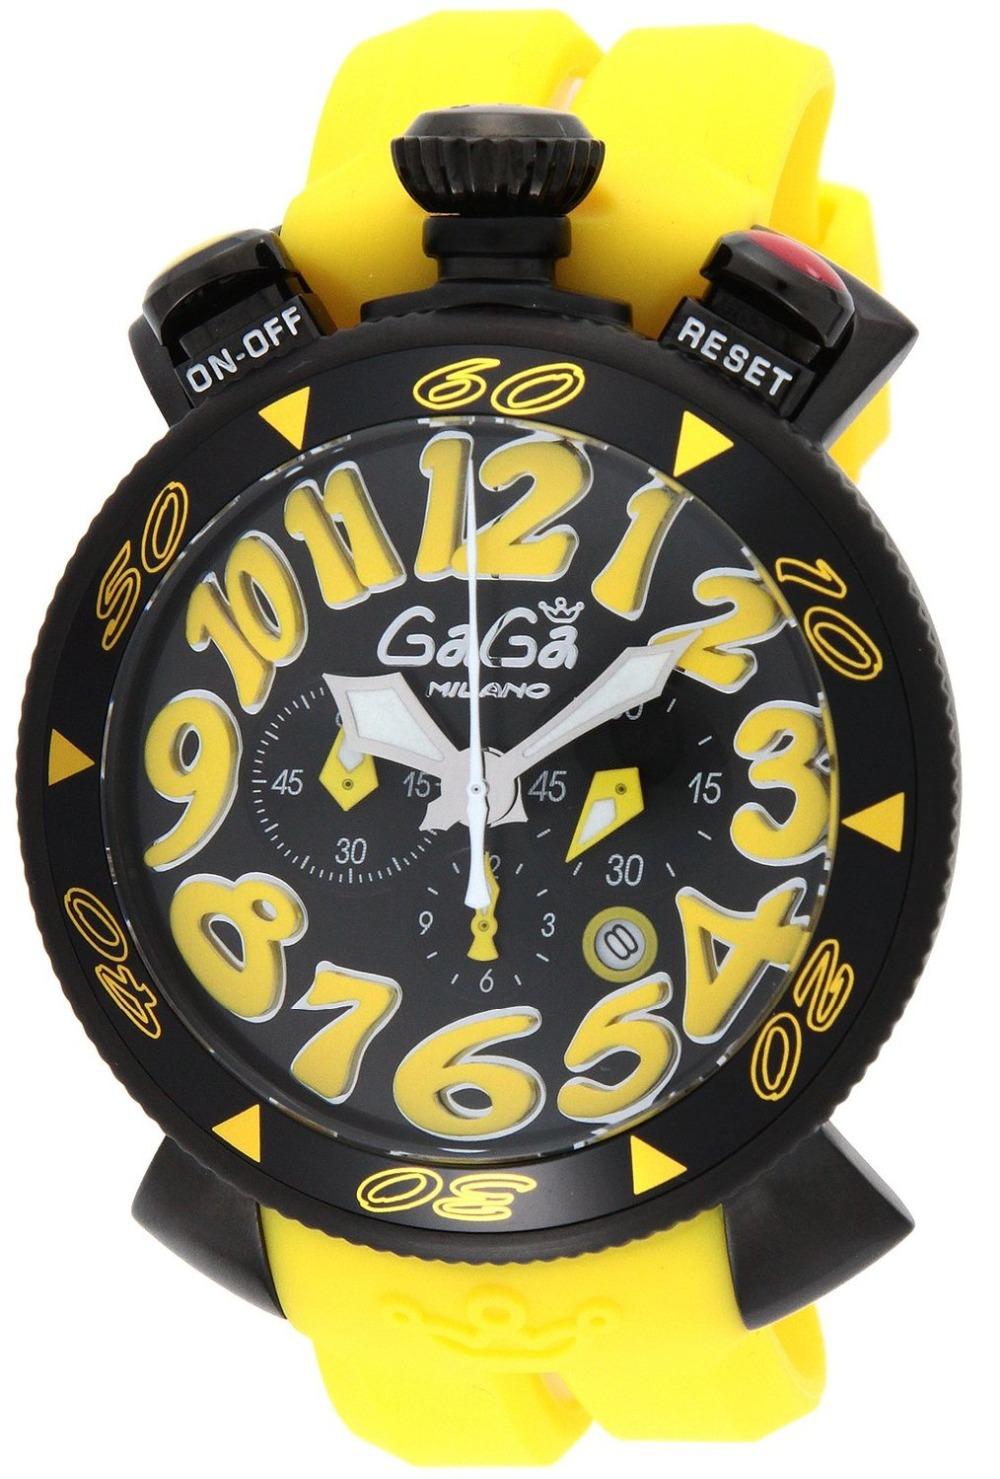 2015 NEW Hot GAGA Chrono 48mm Yellow Men Sport watch Running Cycling Climbing Gaga milano stopwatch gifts Japan 6054.4(China (Mainland))